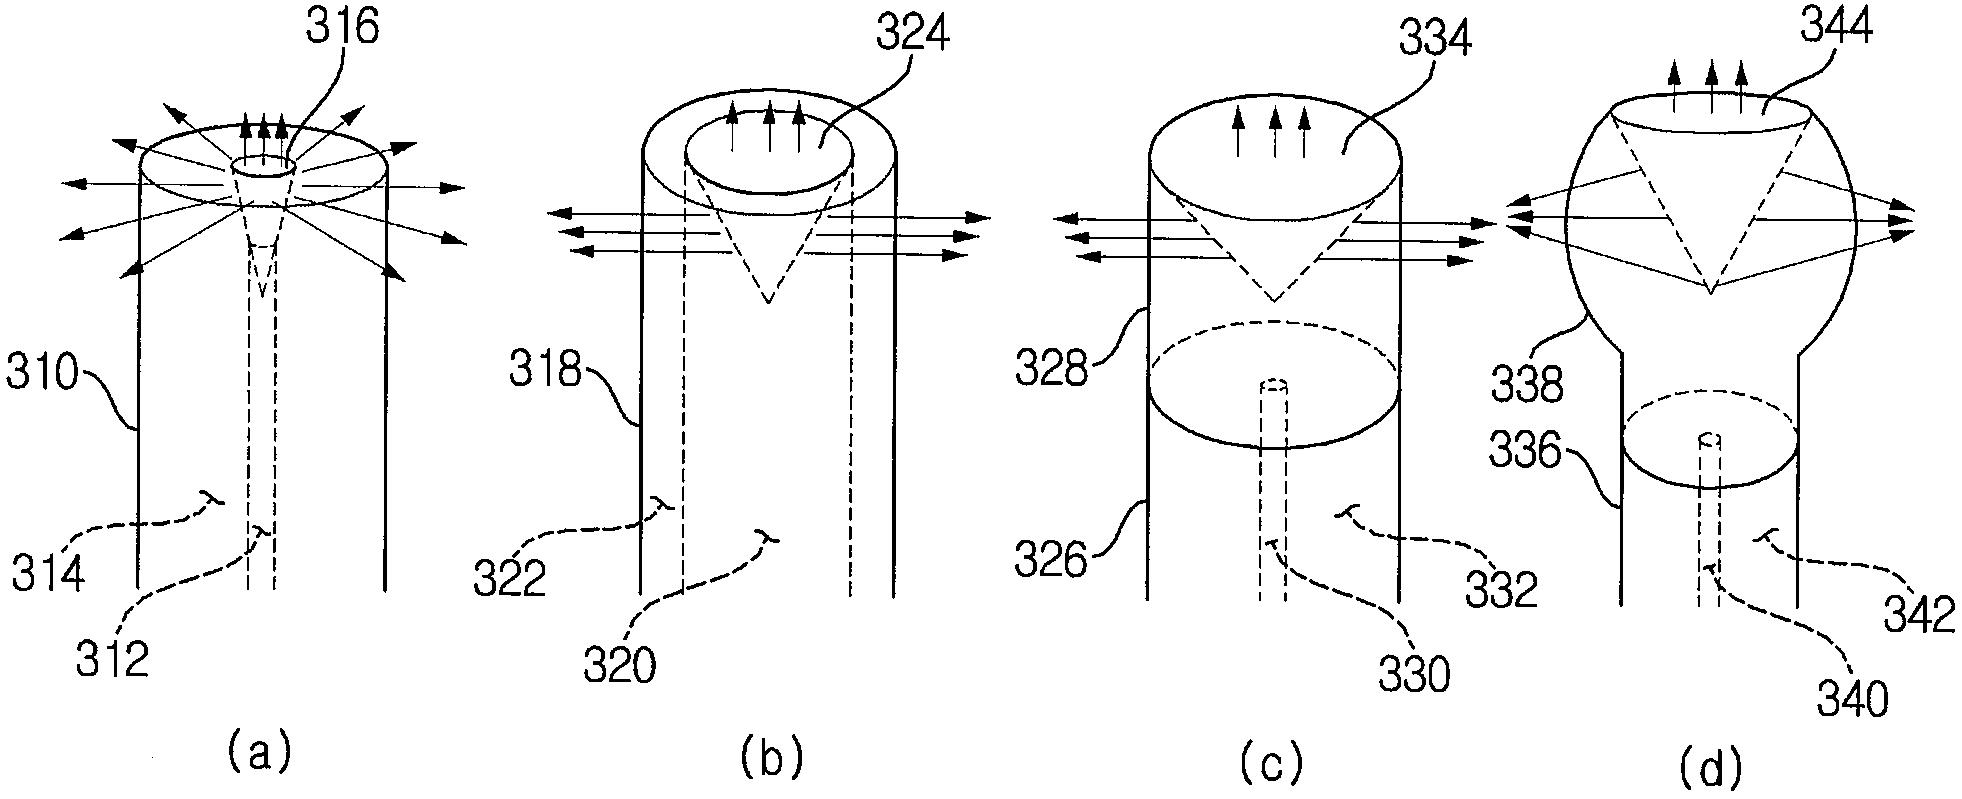 patent wo2011096629a1